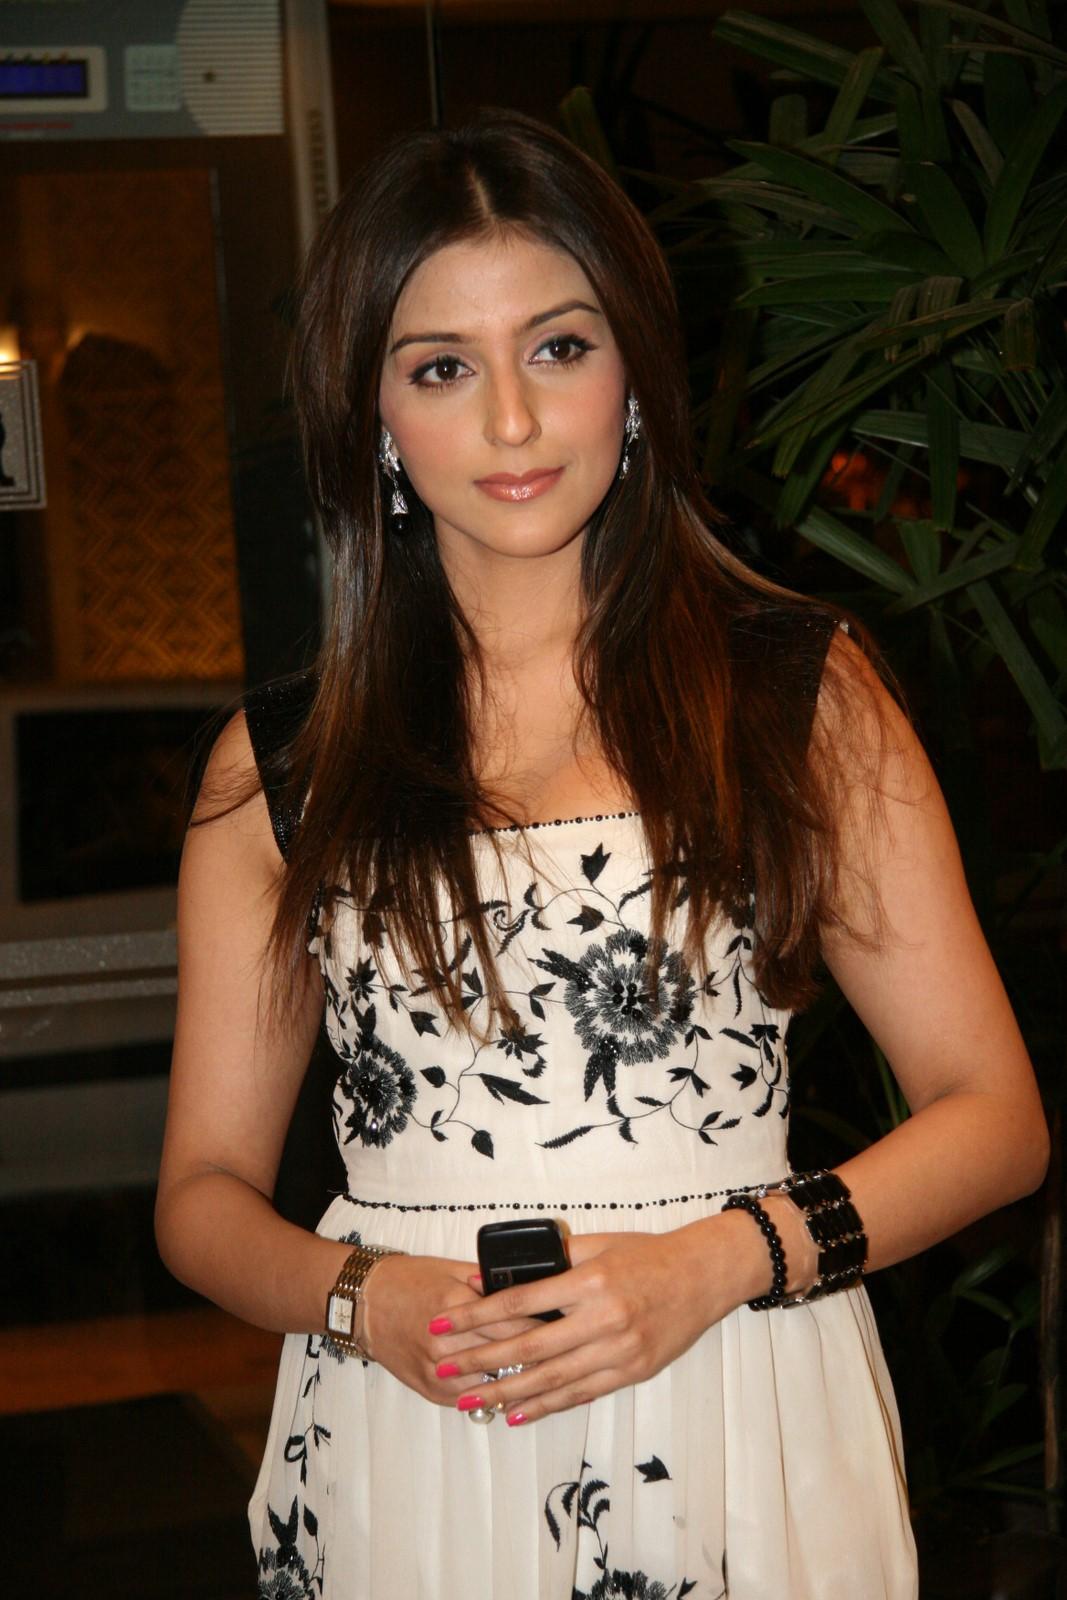 Priya Big Bang Theory Aarti Mann Aarti chhabria latest hot